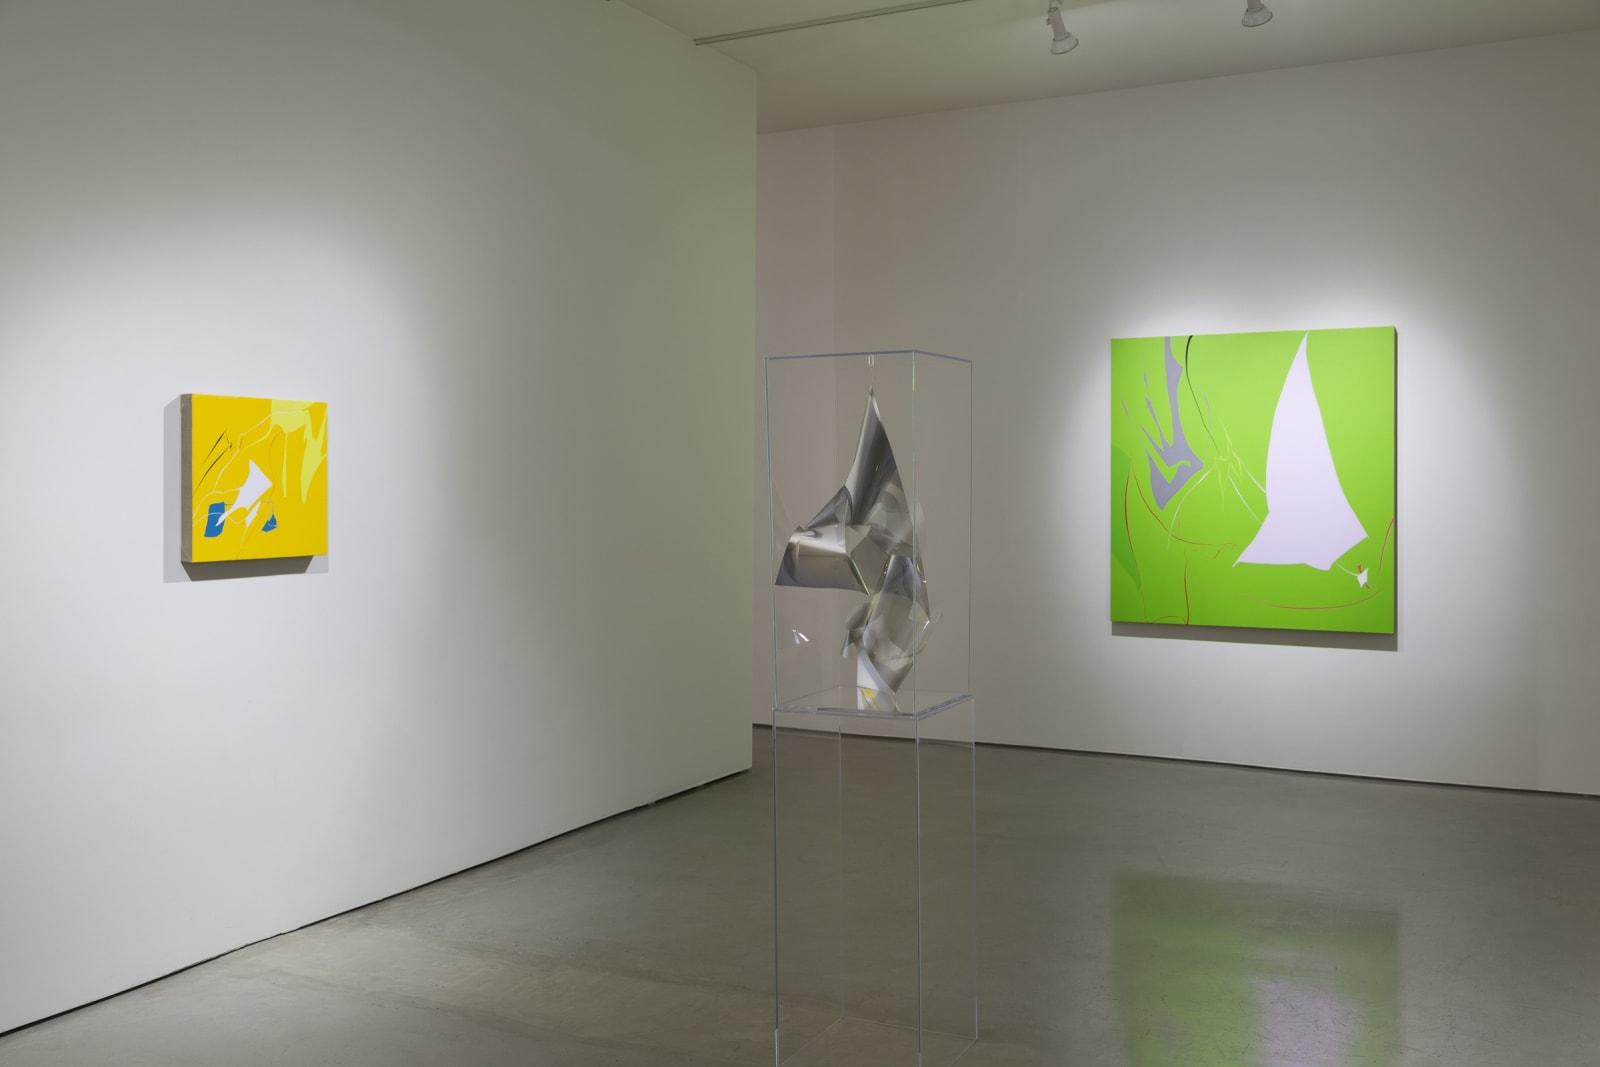 Atmospheric Abstraction | Larry Bell, Gisela Colón, Mara De Luca, and Heather Gwen Martin